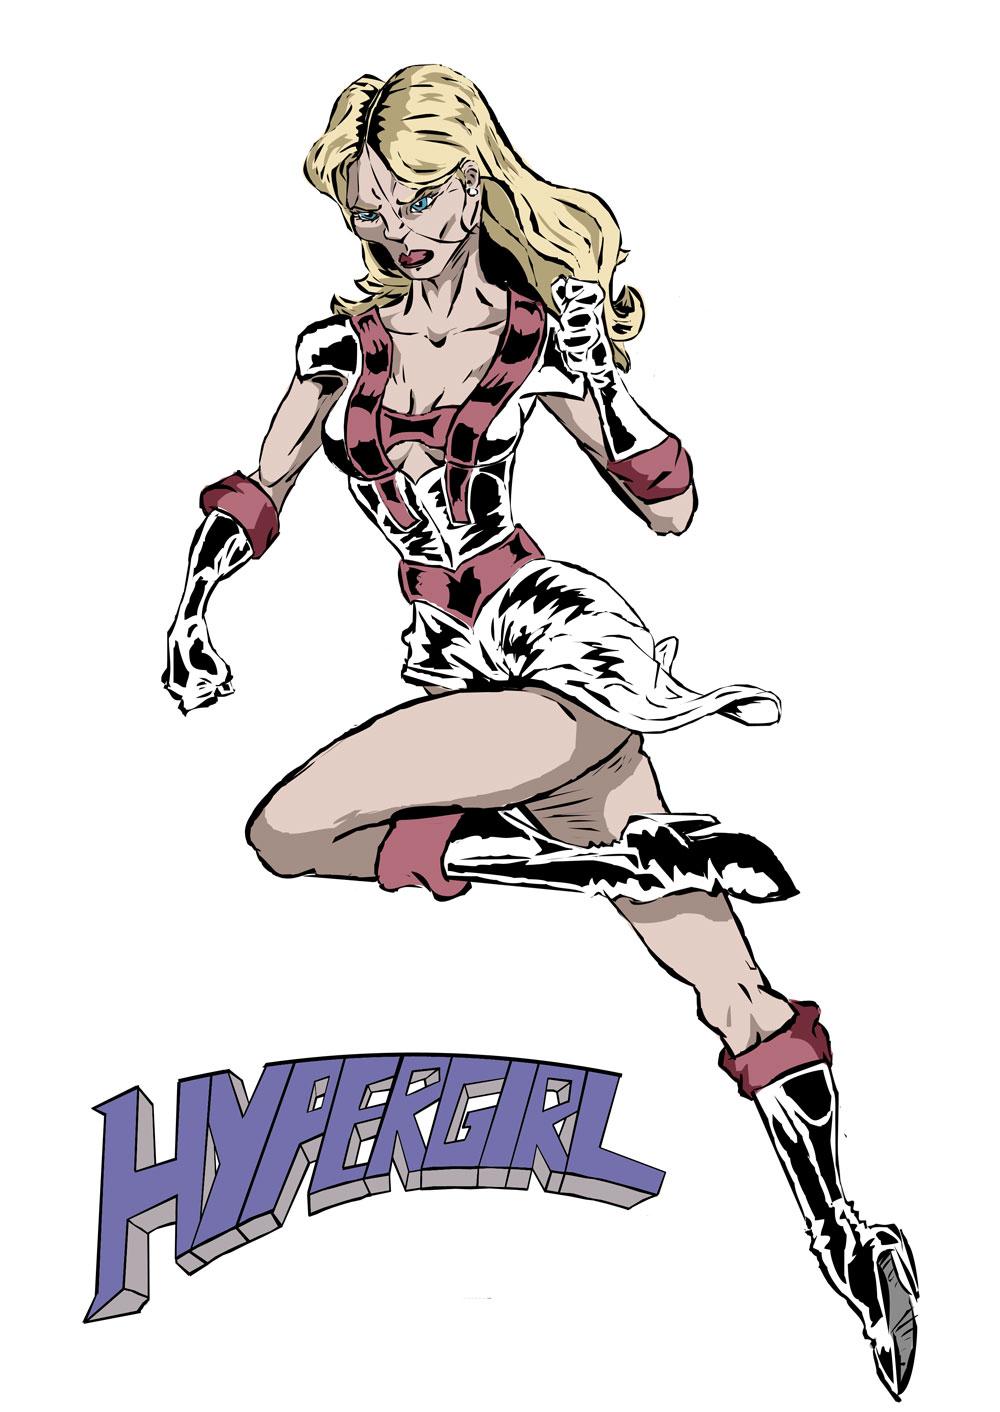 Hypergirl art from a reader!